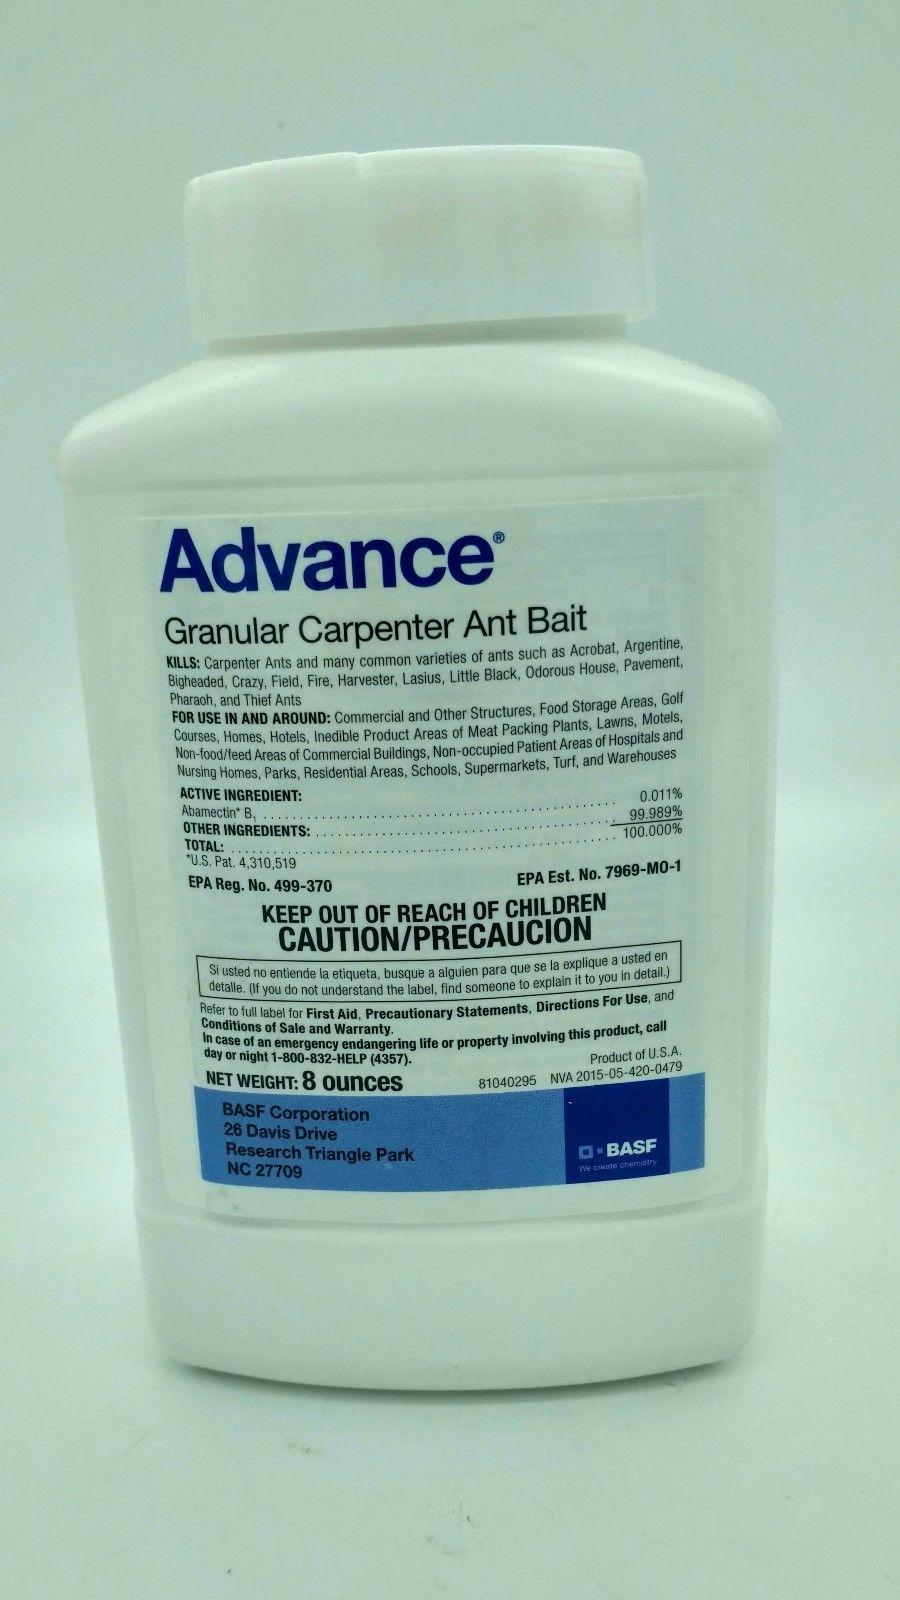 Advance Carpenter Ant Granular Bait Pest Control 8 Oz | Bait ...